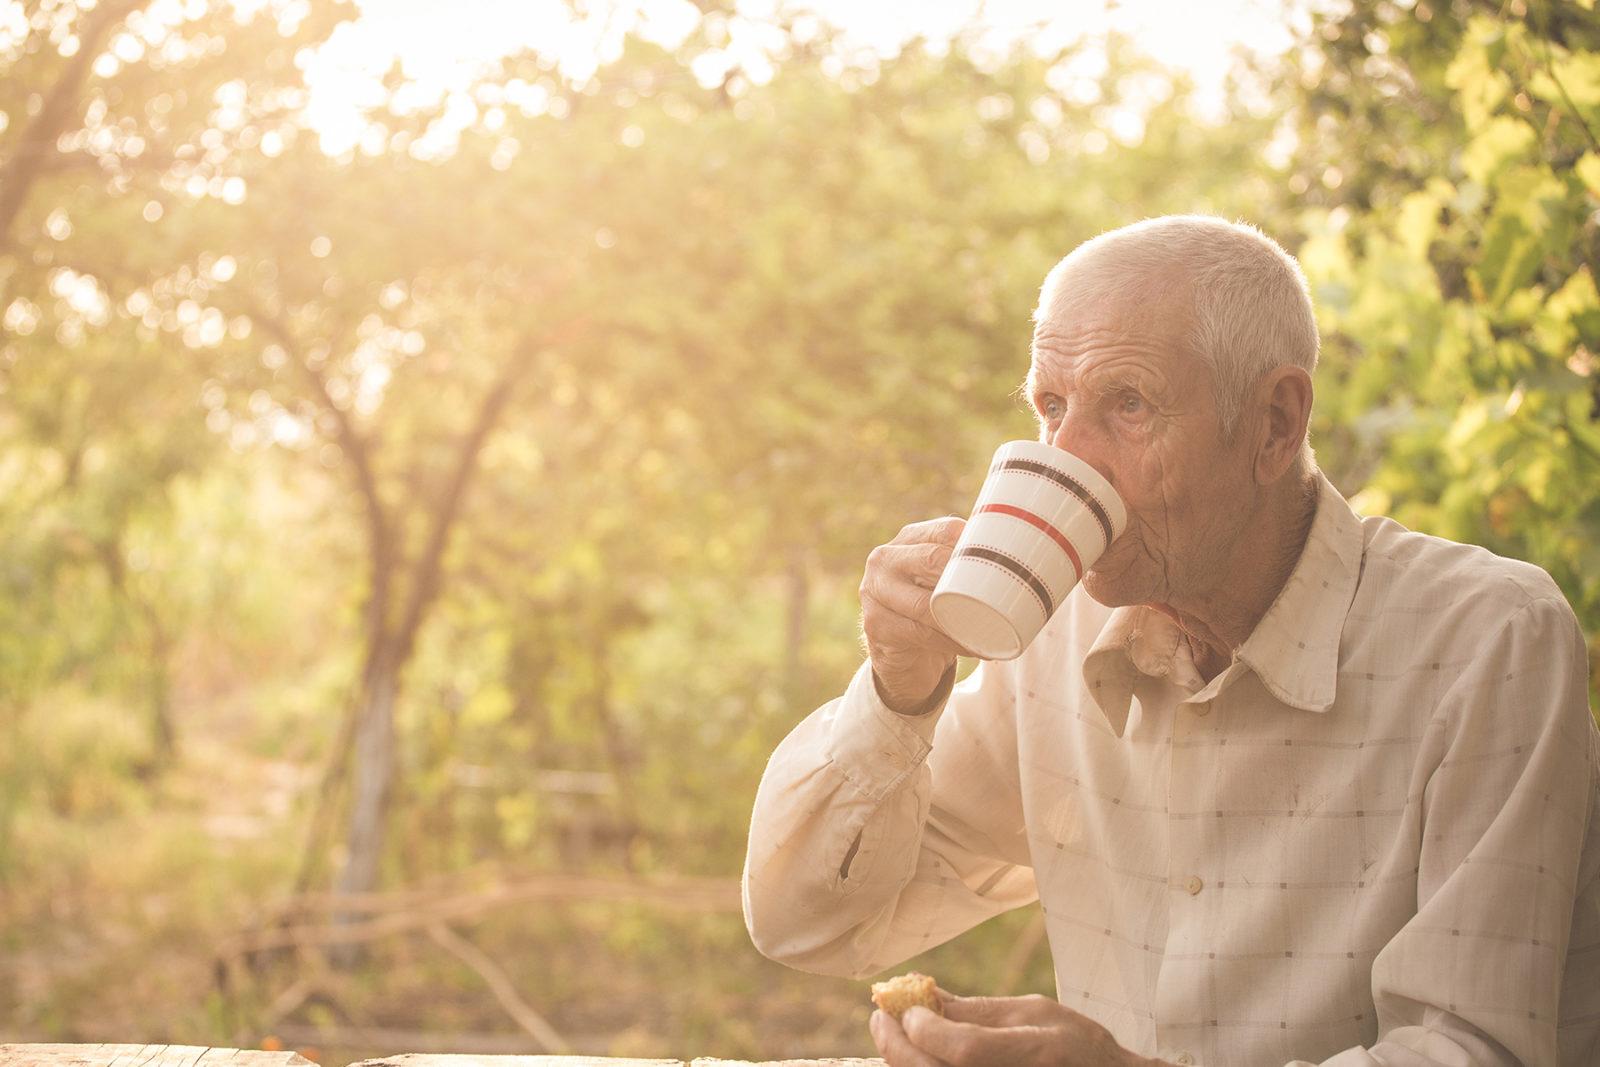 Senior man drinking a tea in his garden adjusting to retirement